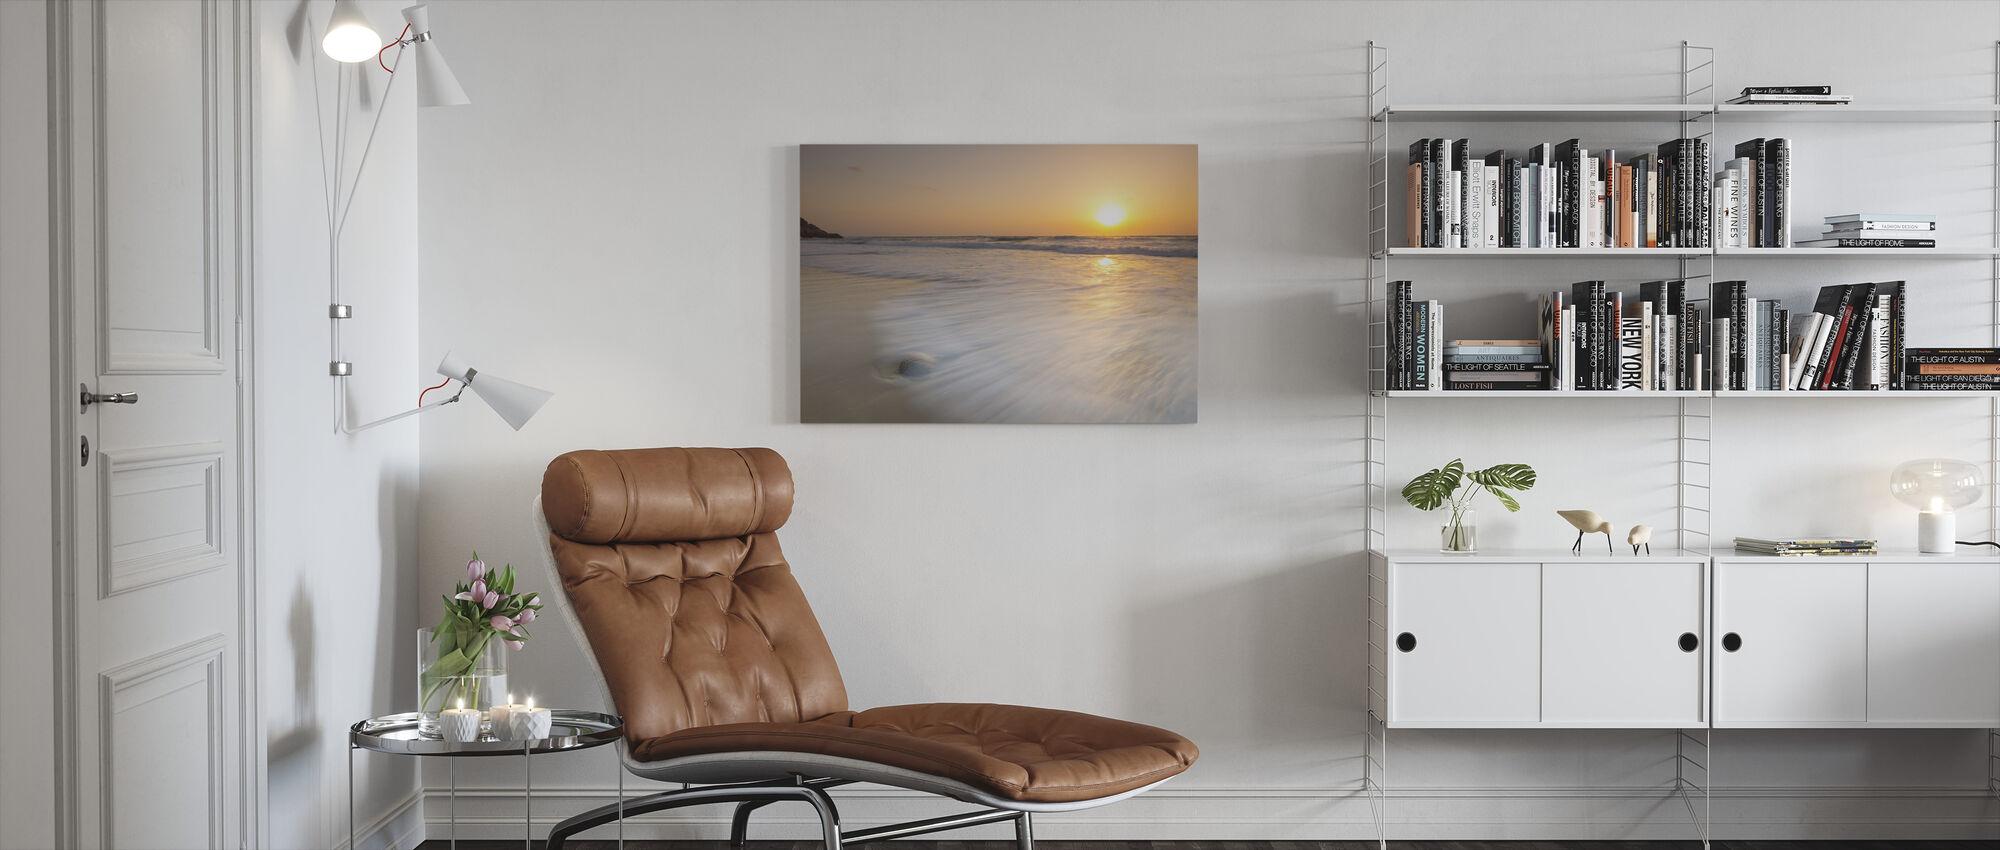 Solnedgang strand - Lerretsbilde - Stue